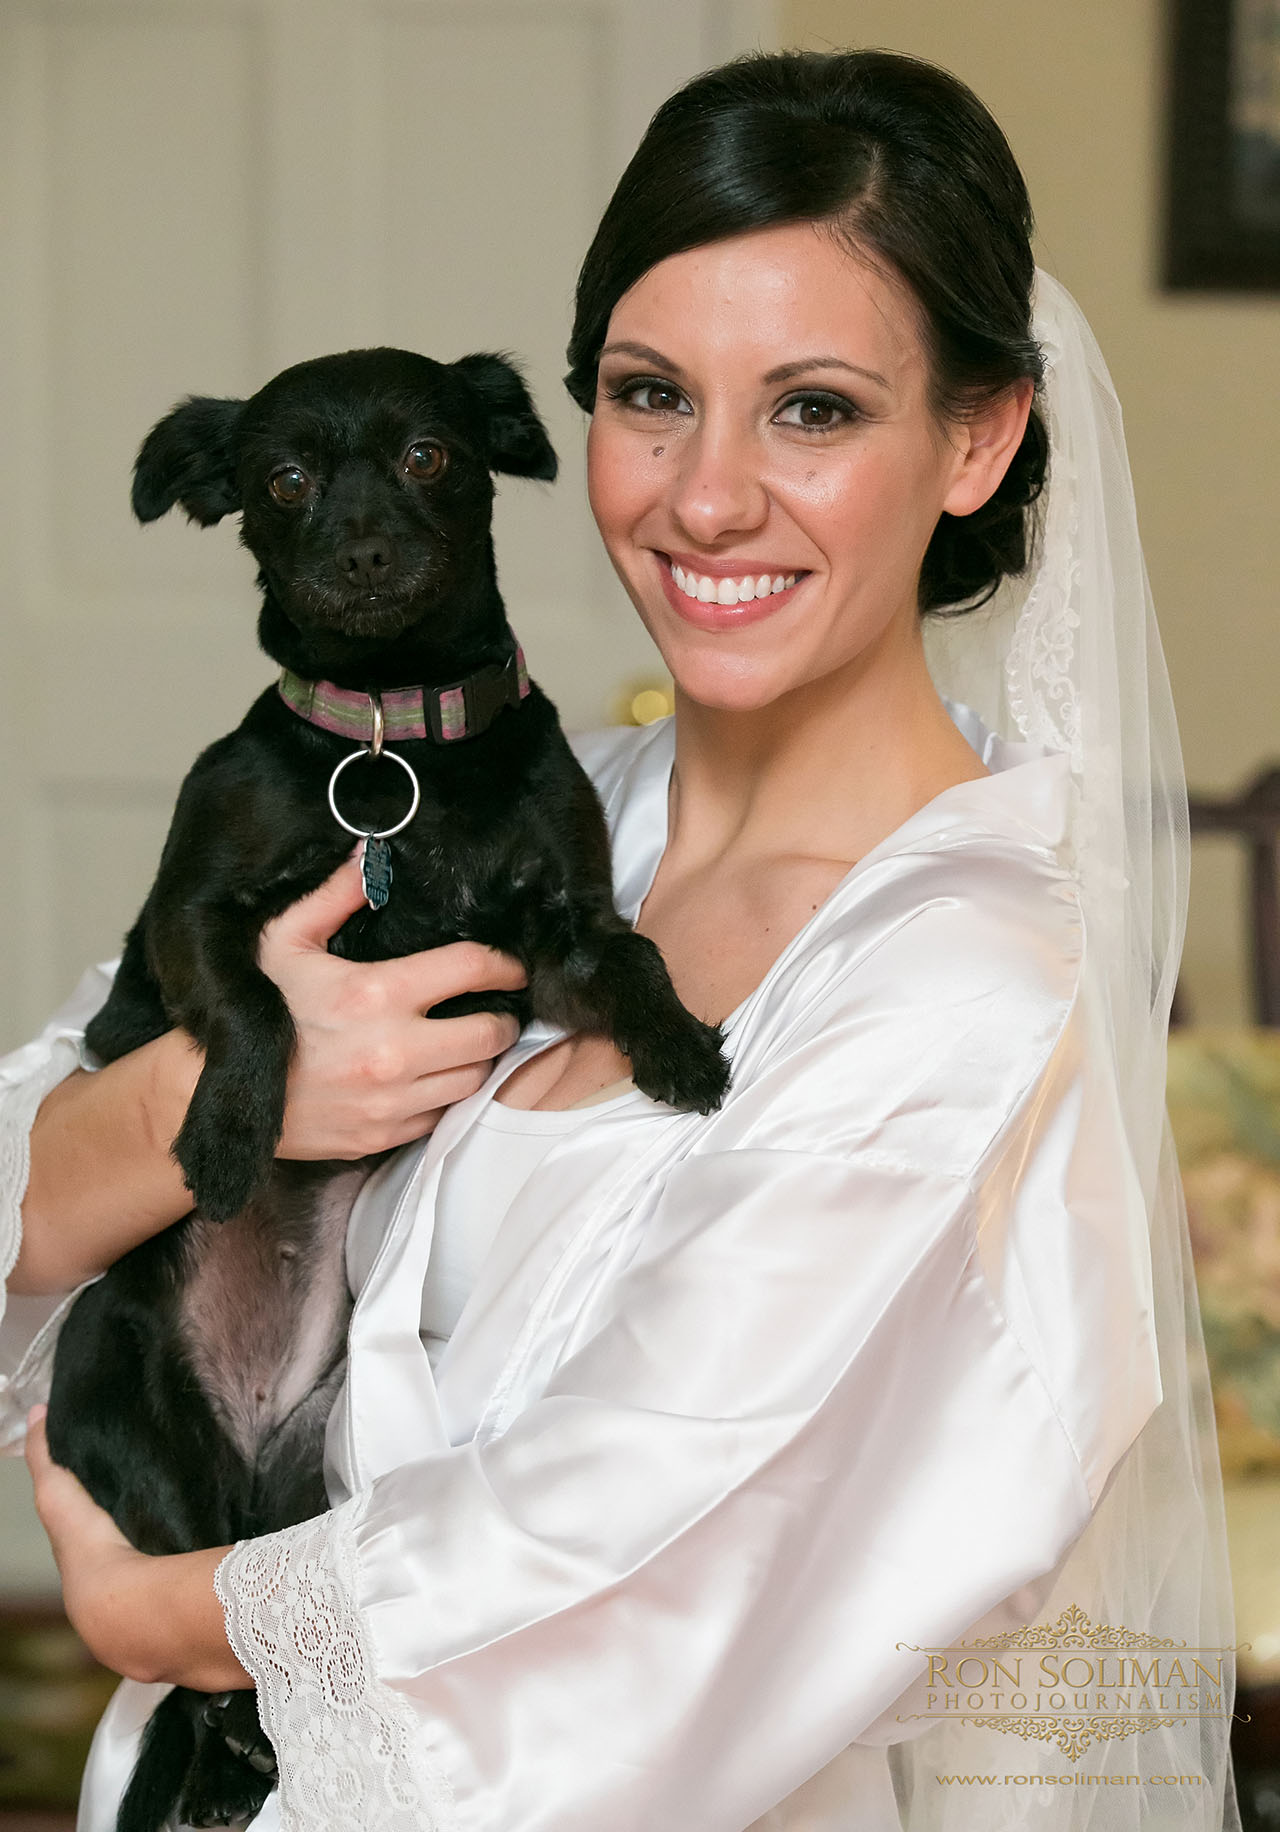 Saint Francis of Assisi Parish Springfield, PA wedding